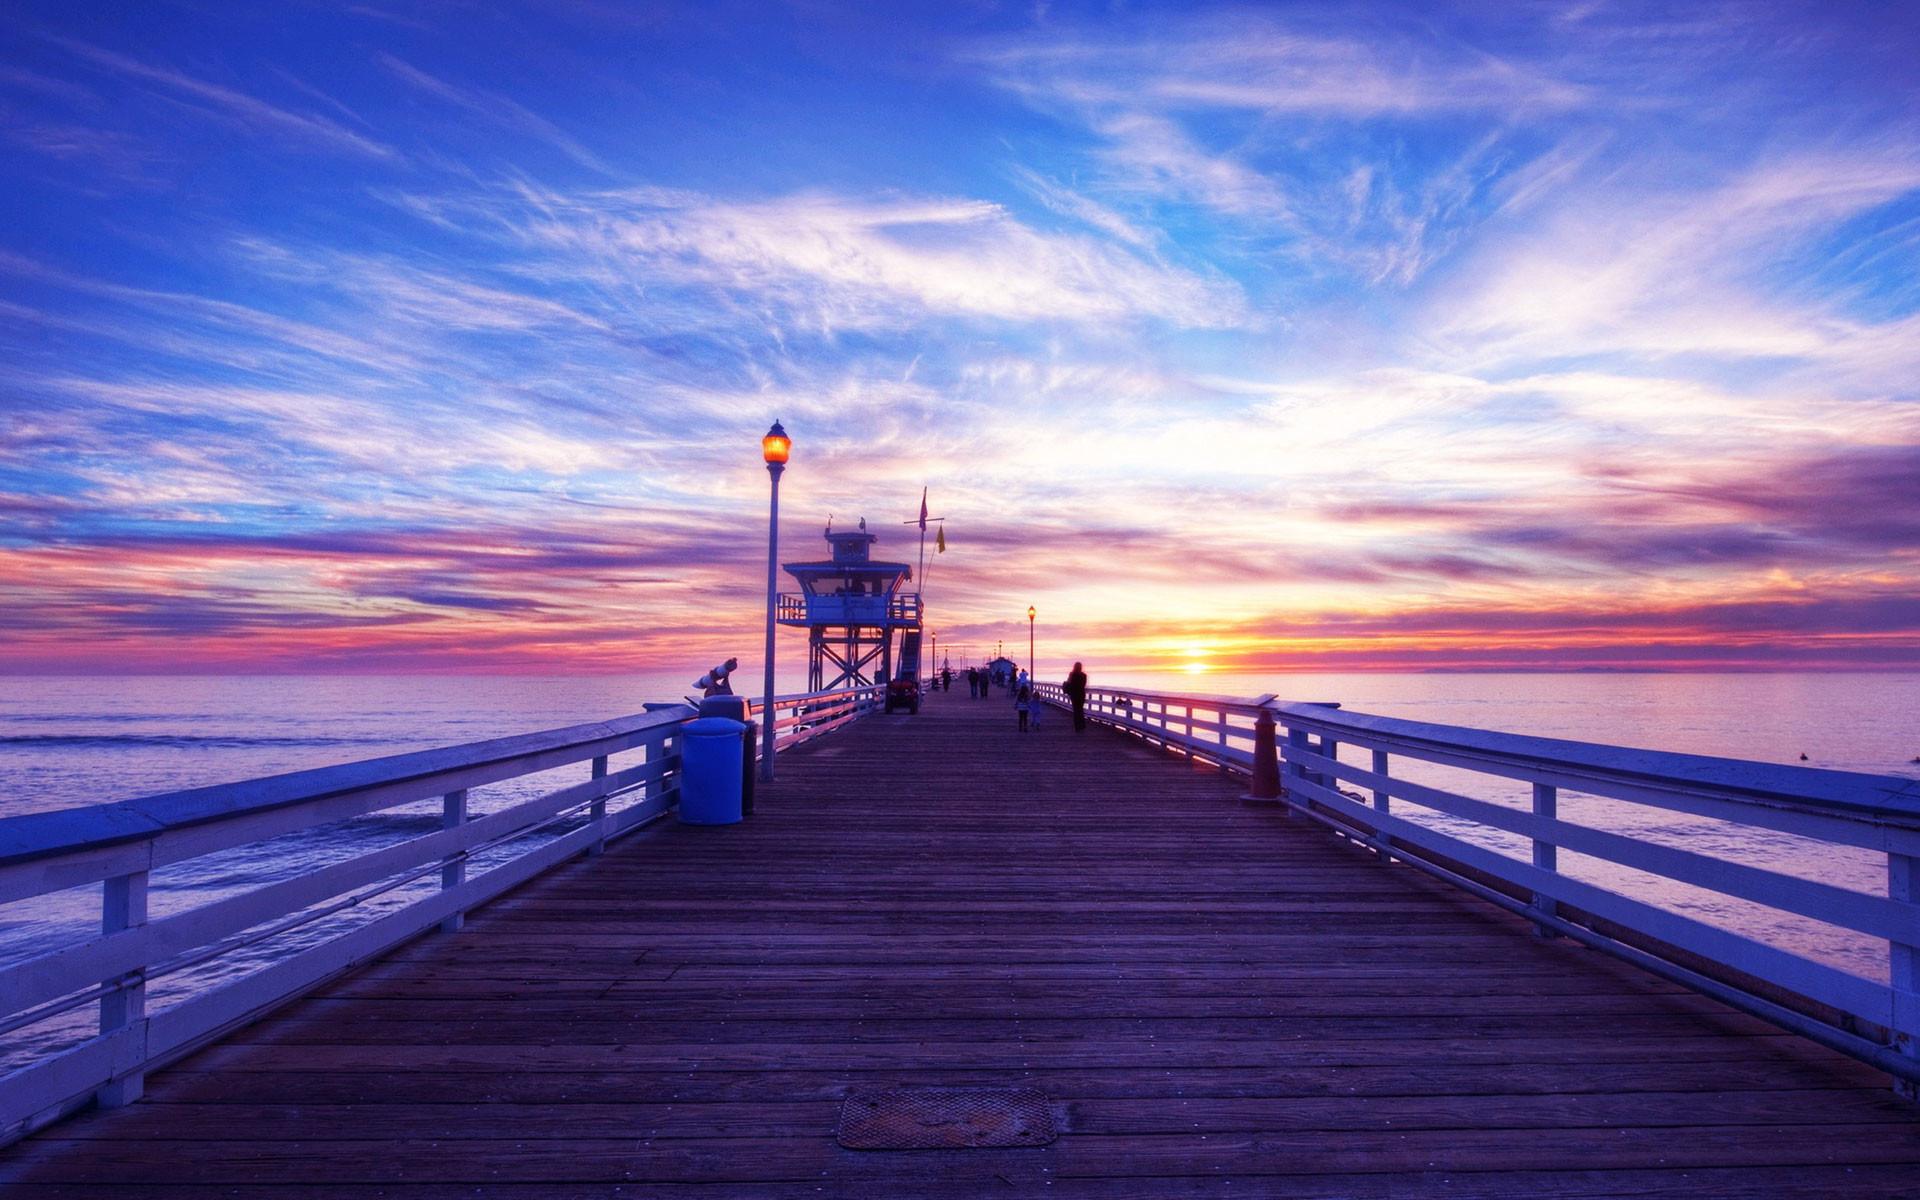 Pier sunset background